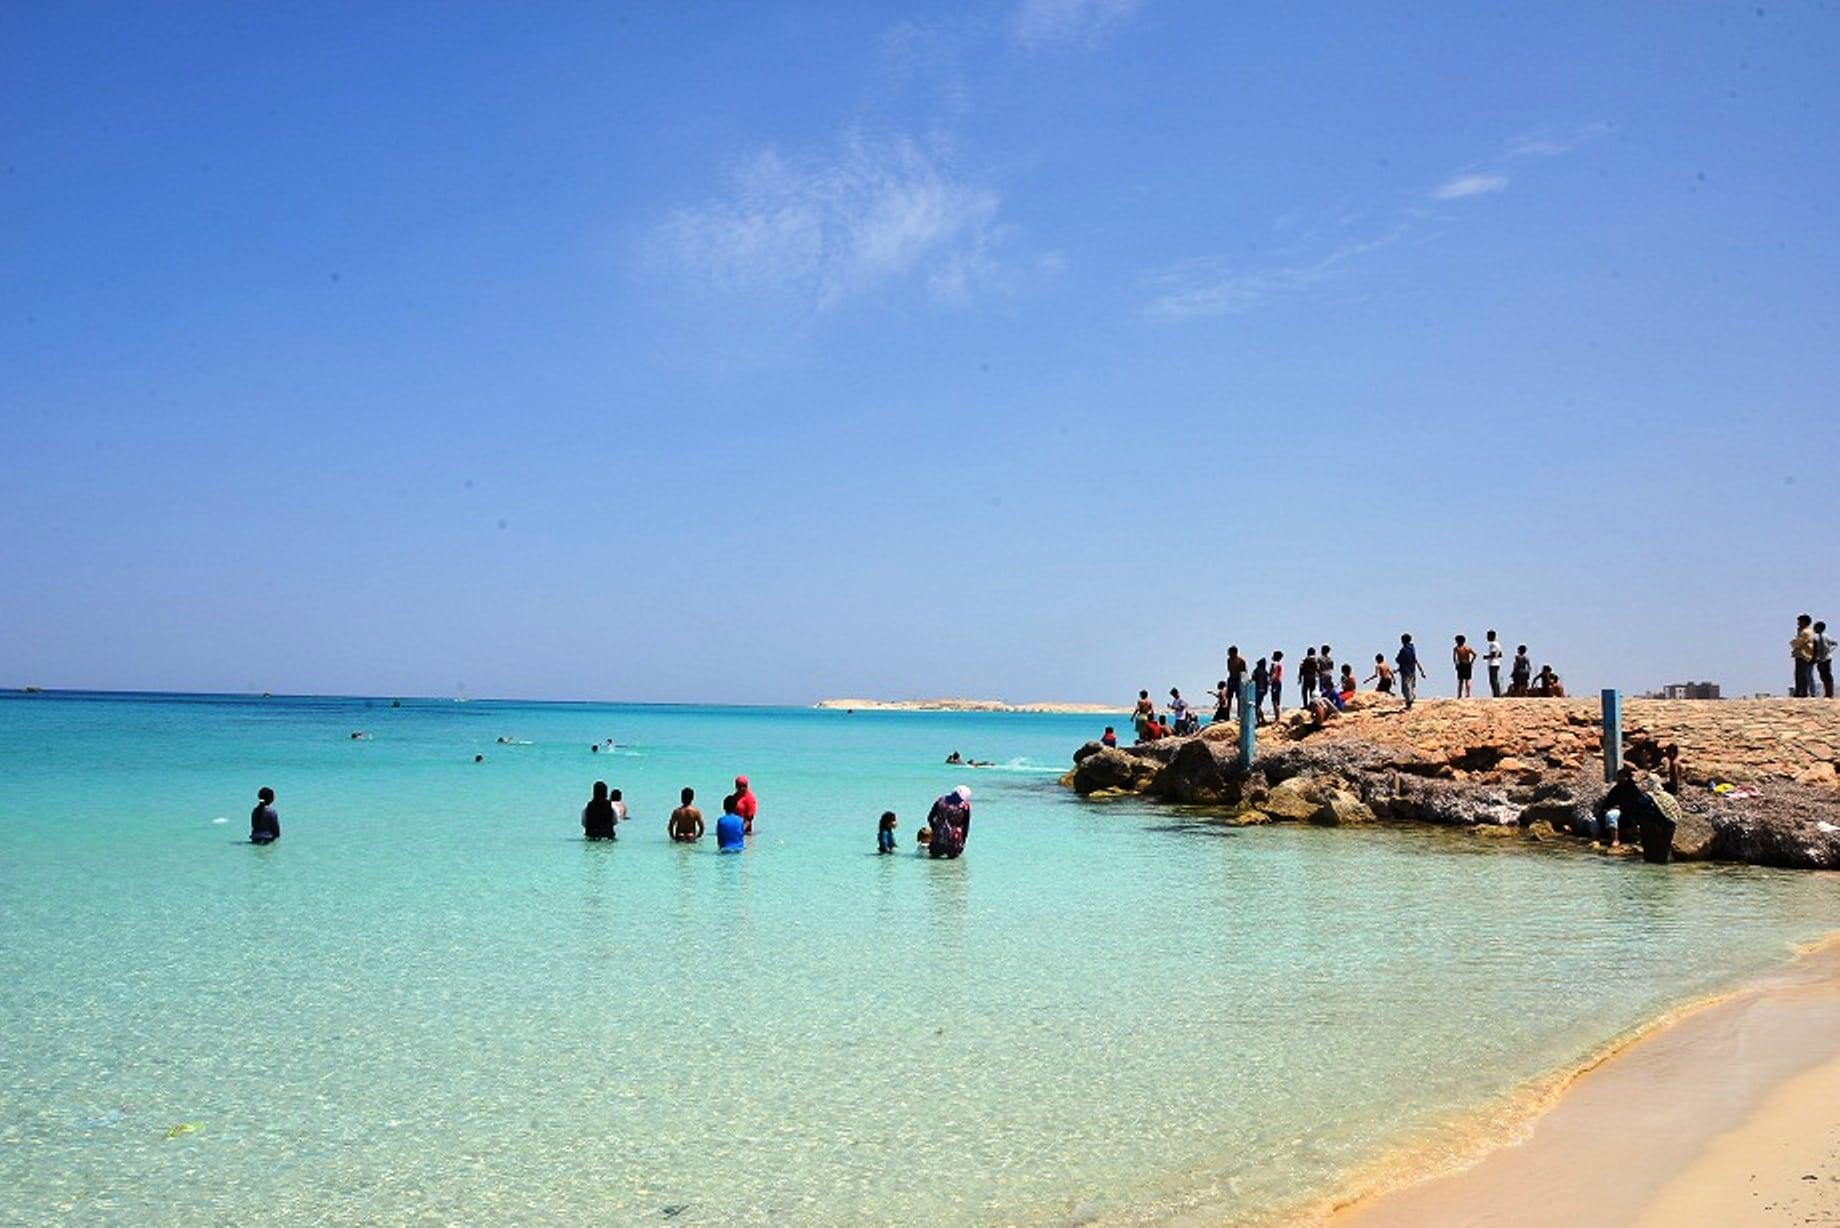 شواطئ مرسي مطروح